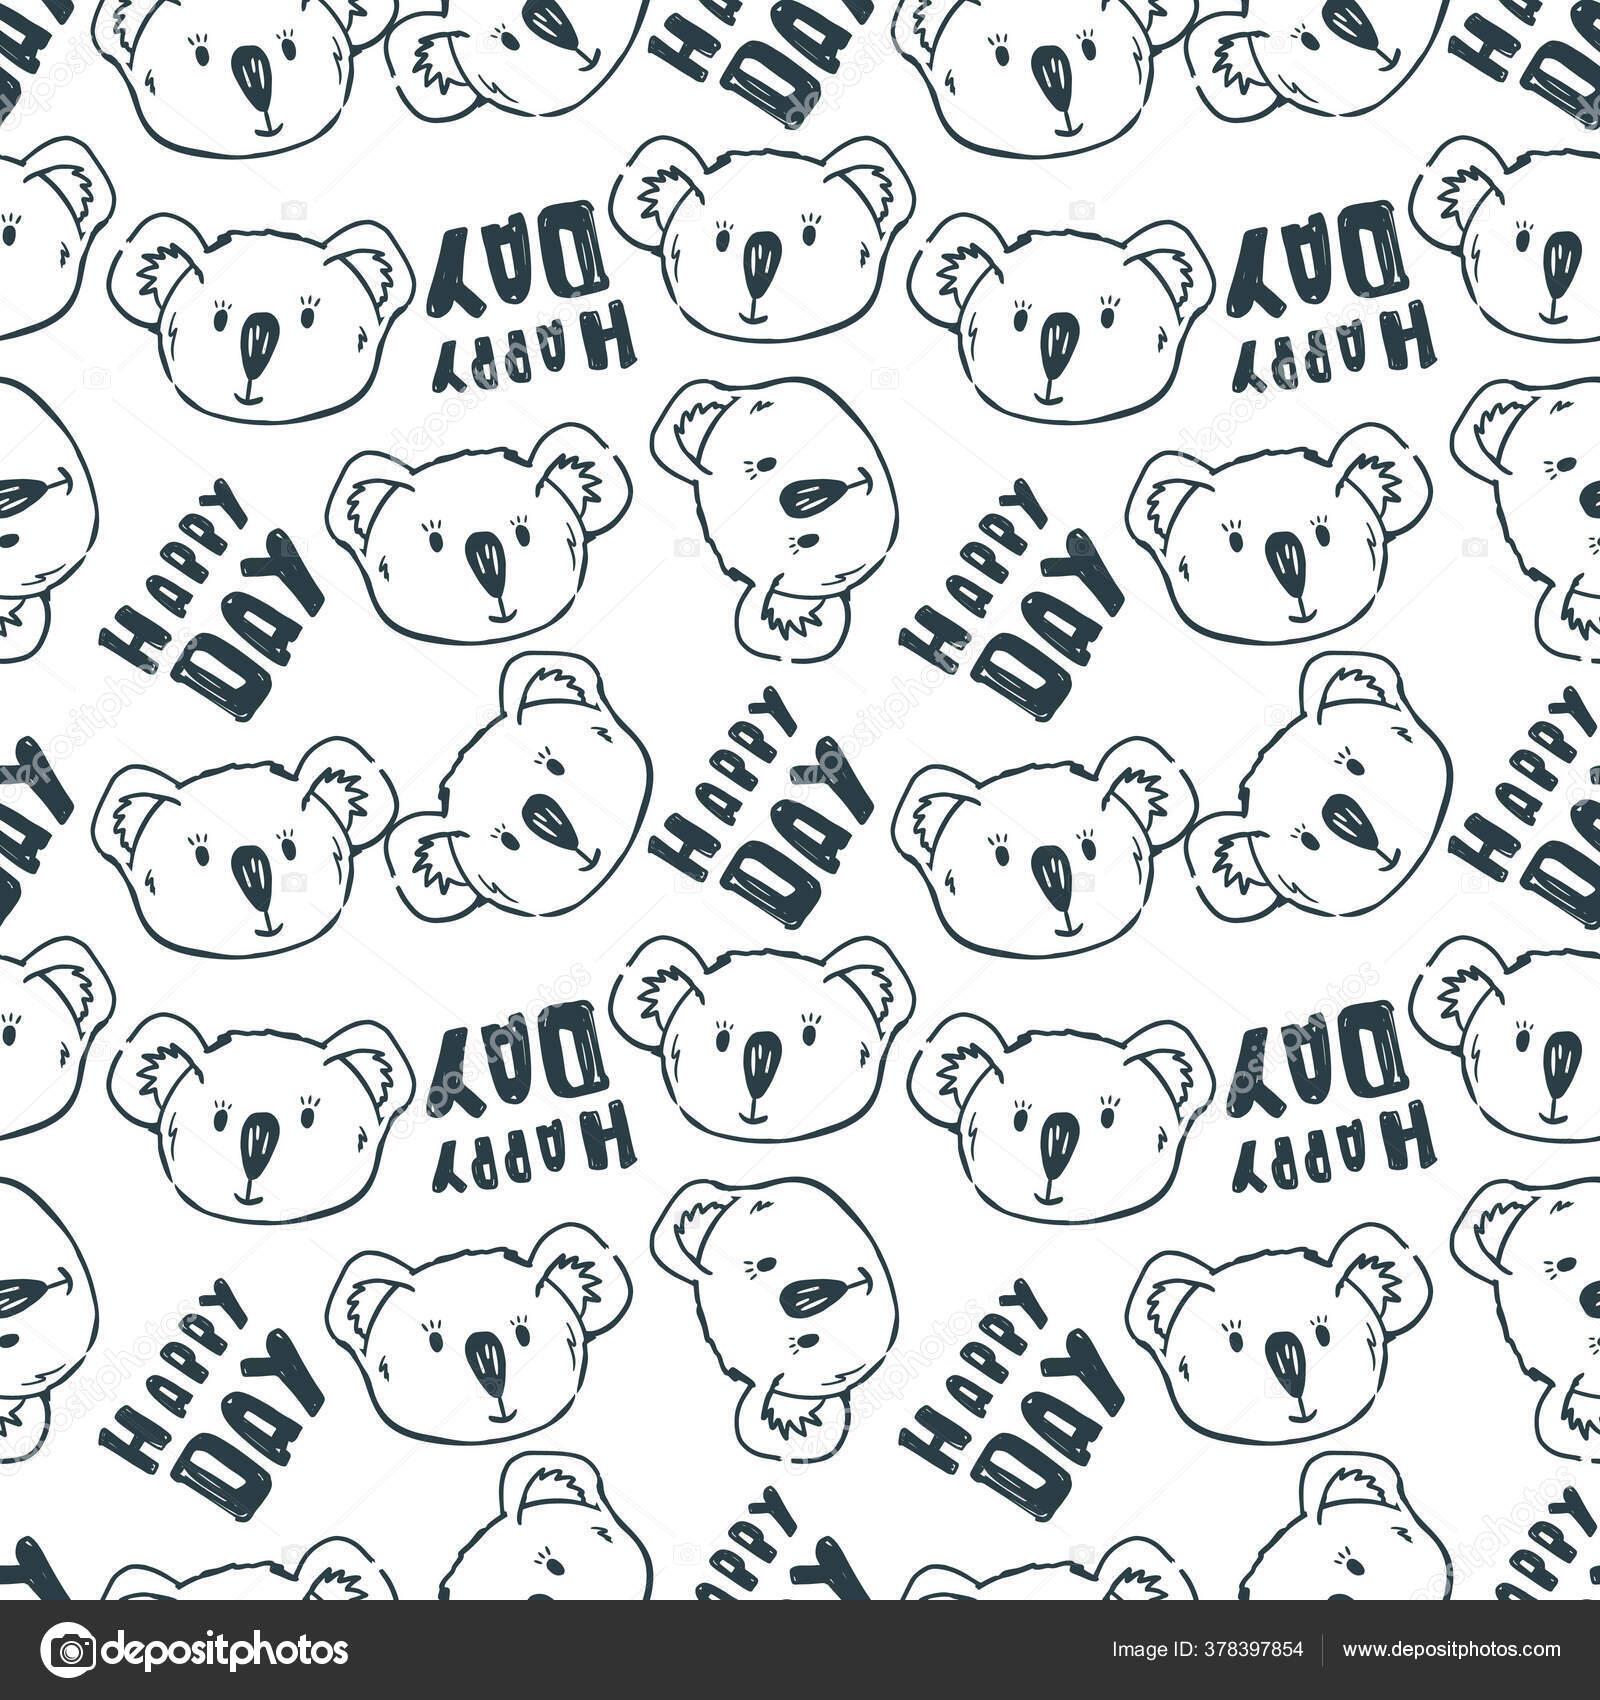 depositphotos 378397854 stock illustration vector seamless pattern cute outline